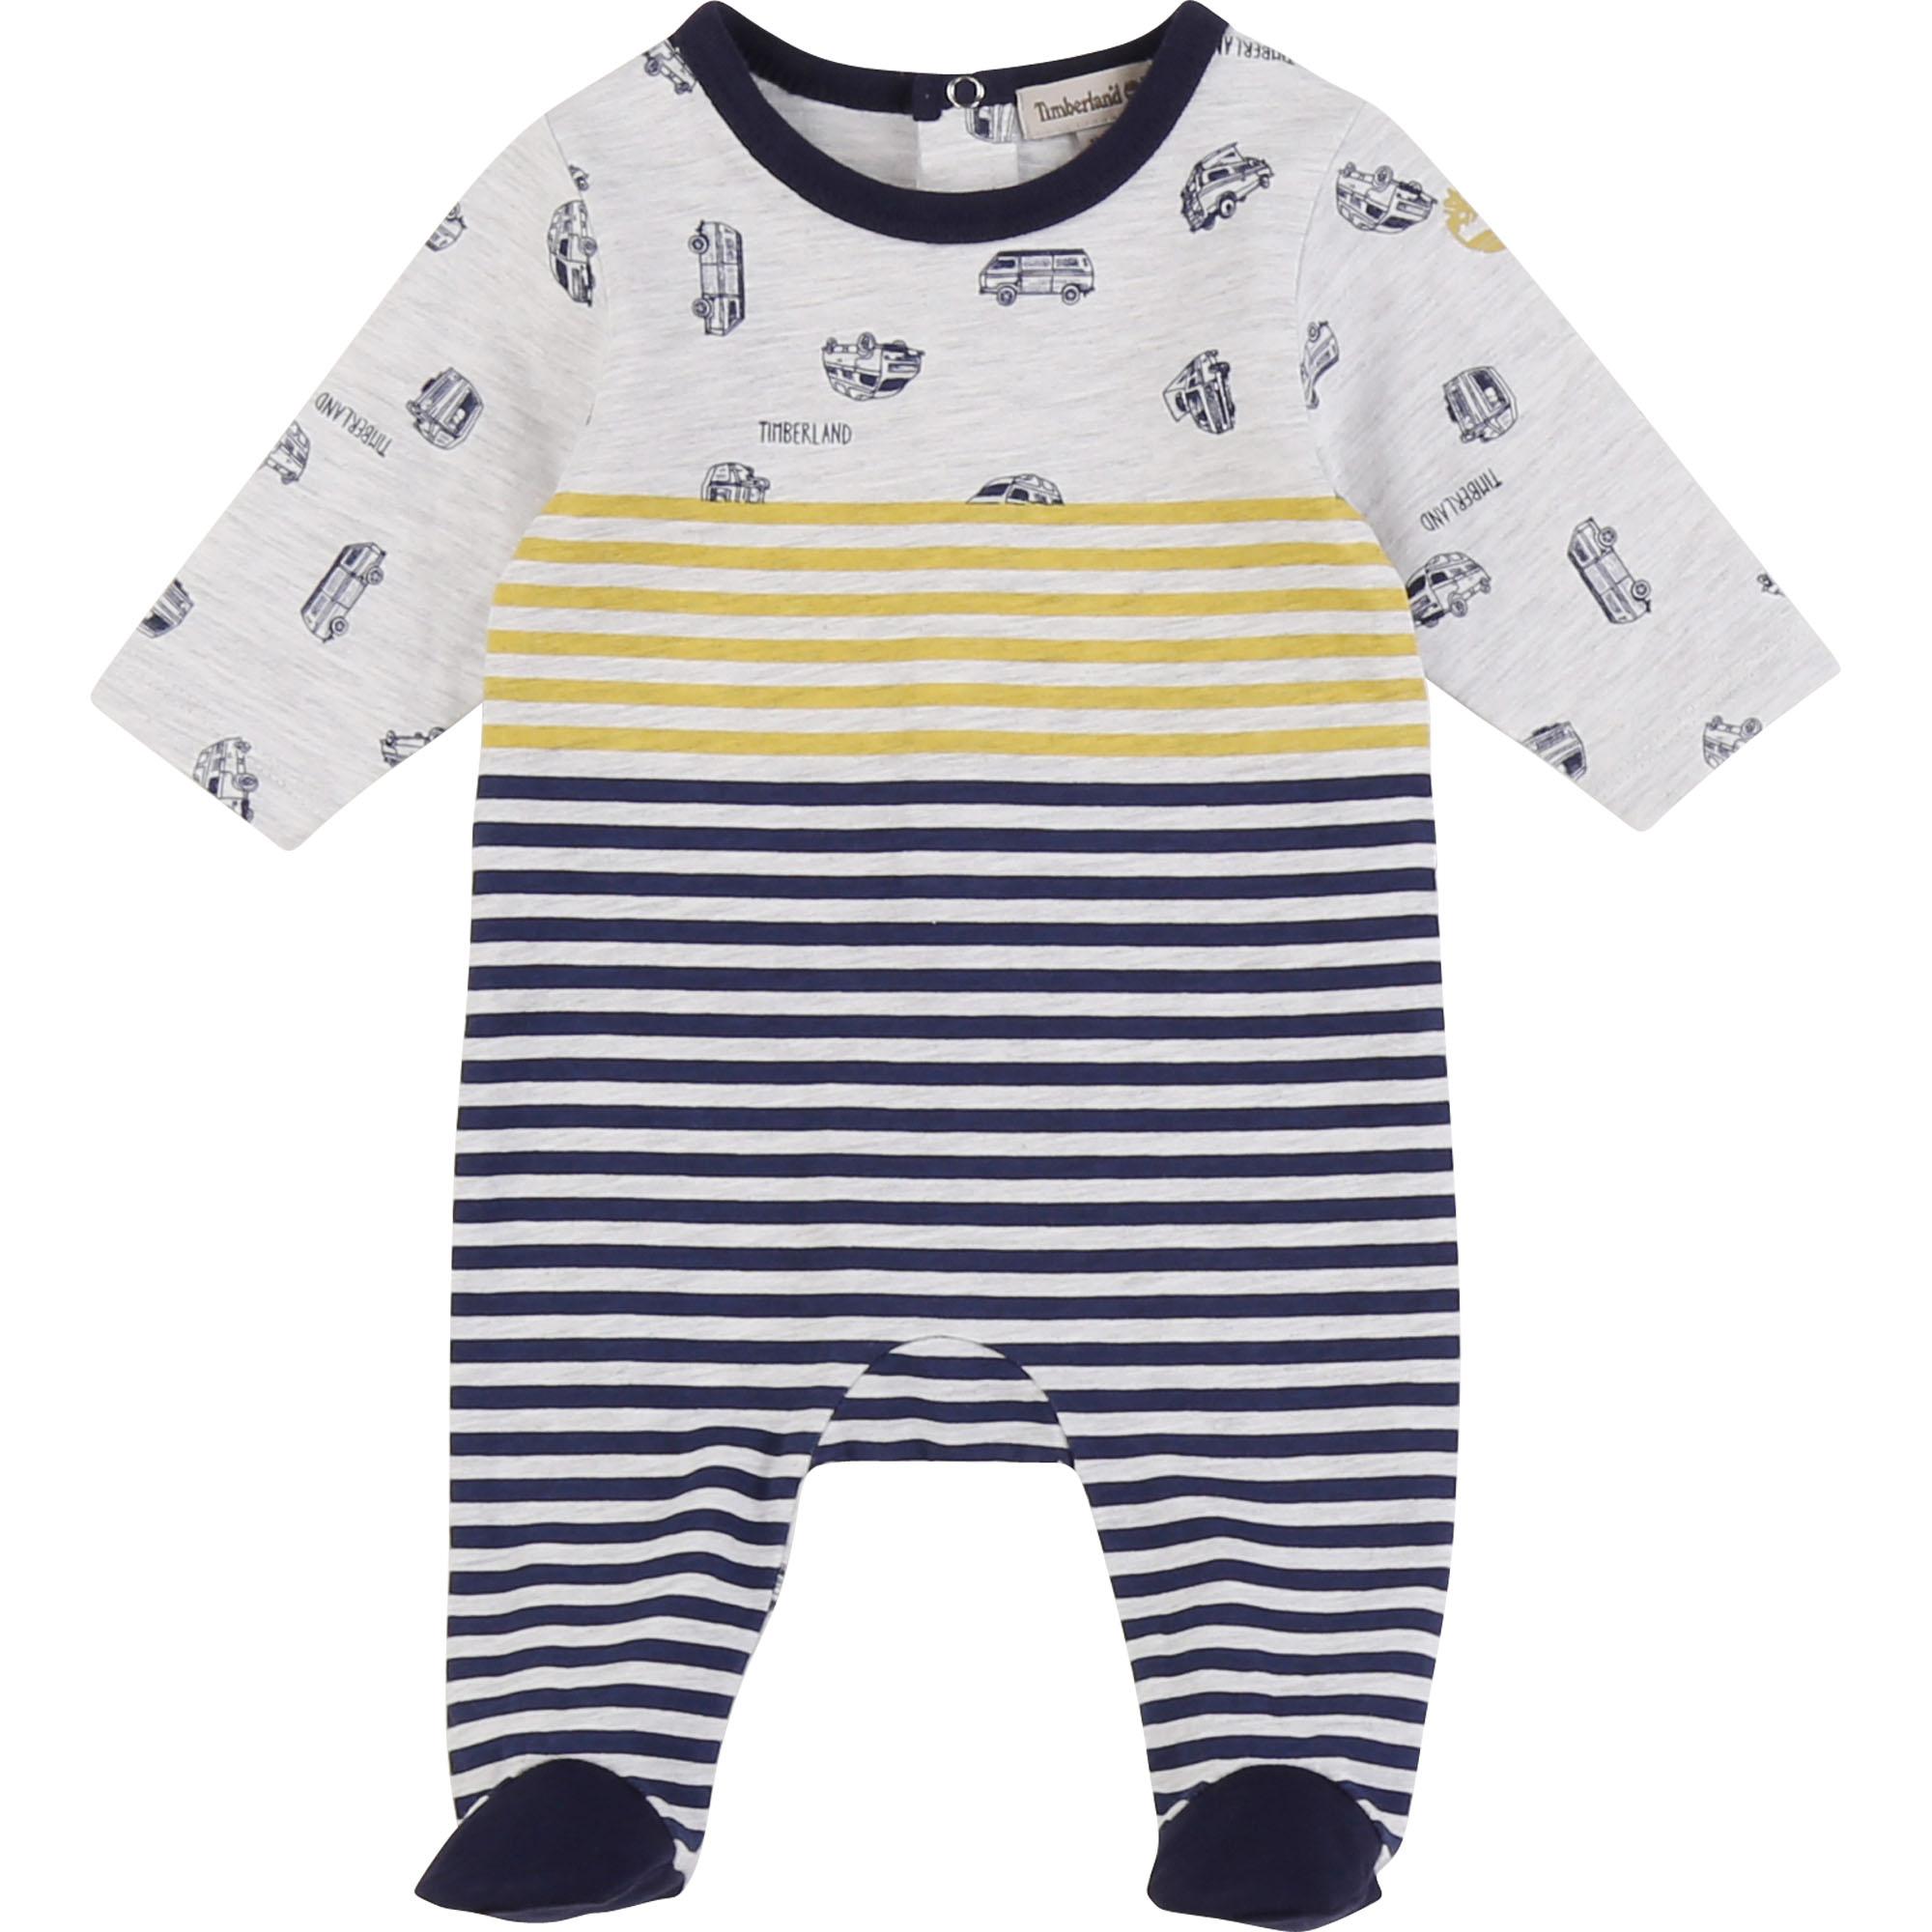 Pyjama en jersey coton imprimé TIMBERLAND BEBE COUCHE GARCON Gris